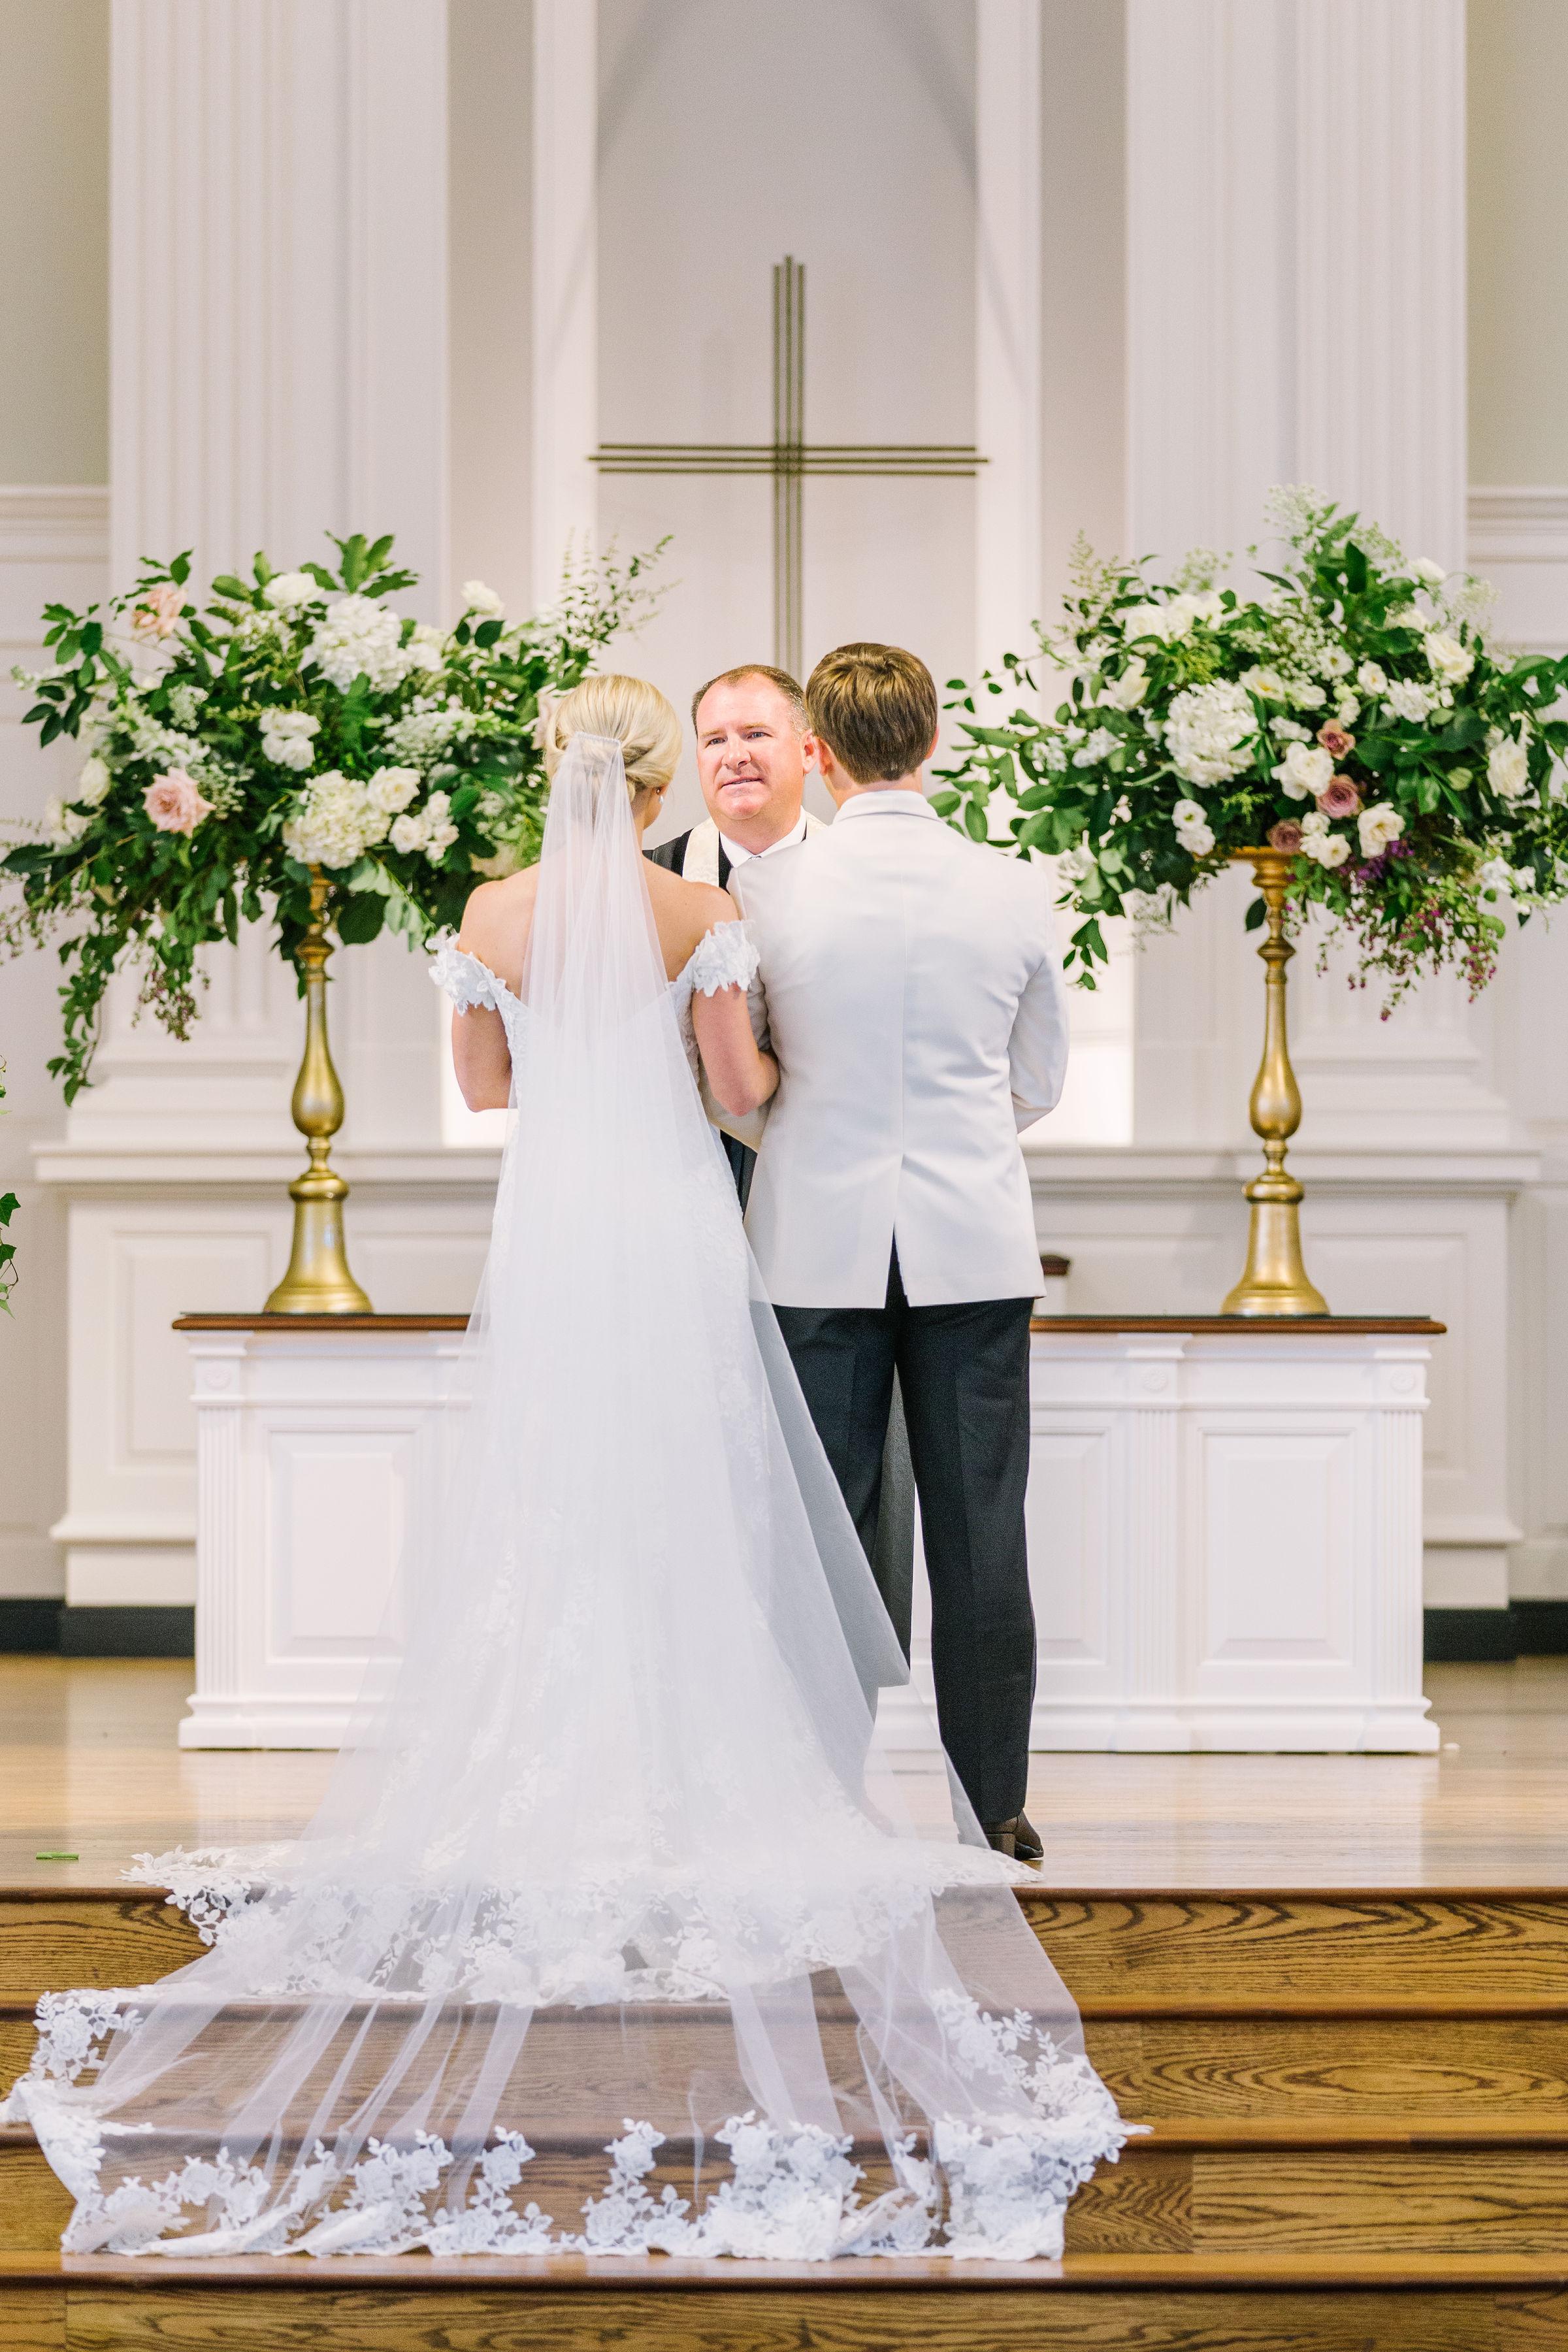 Ellen-Ashton-Photography-Girt-and-gold-events-weddings-Ashton-Depot-Weddings947.jpg